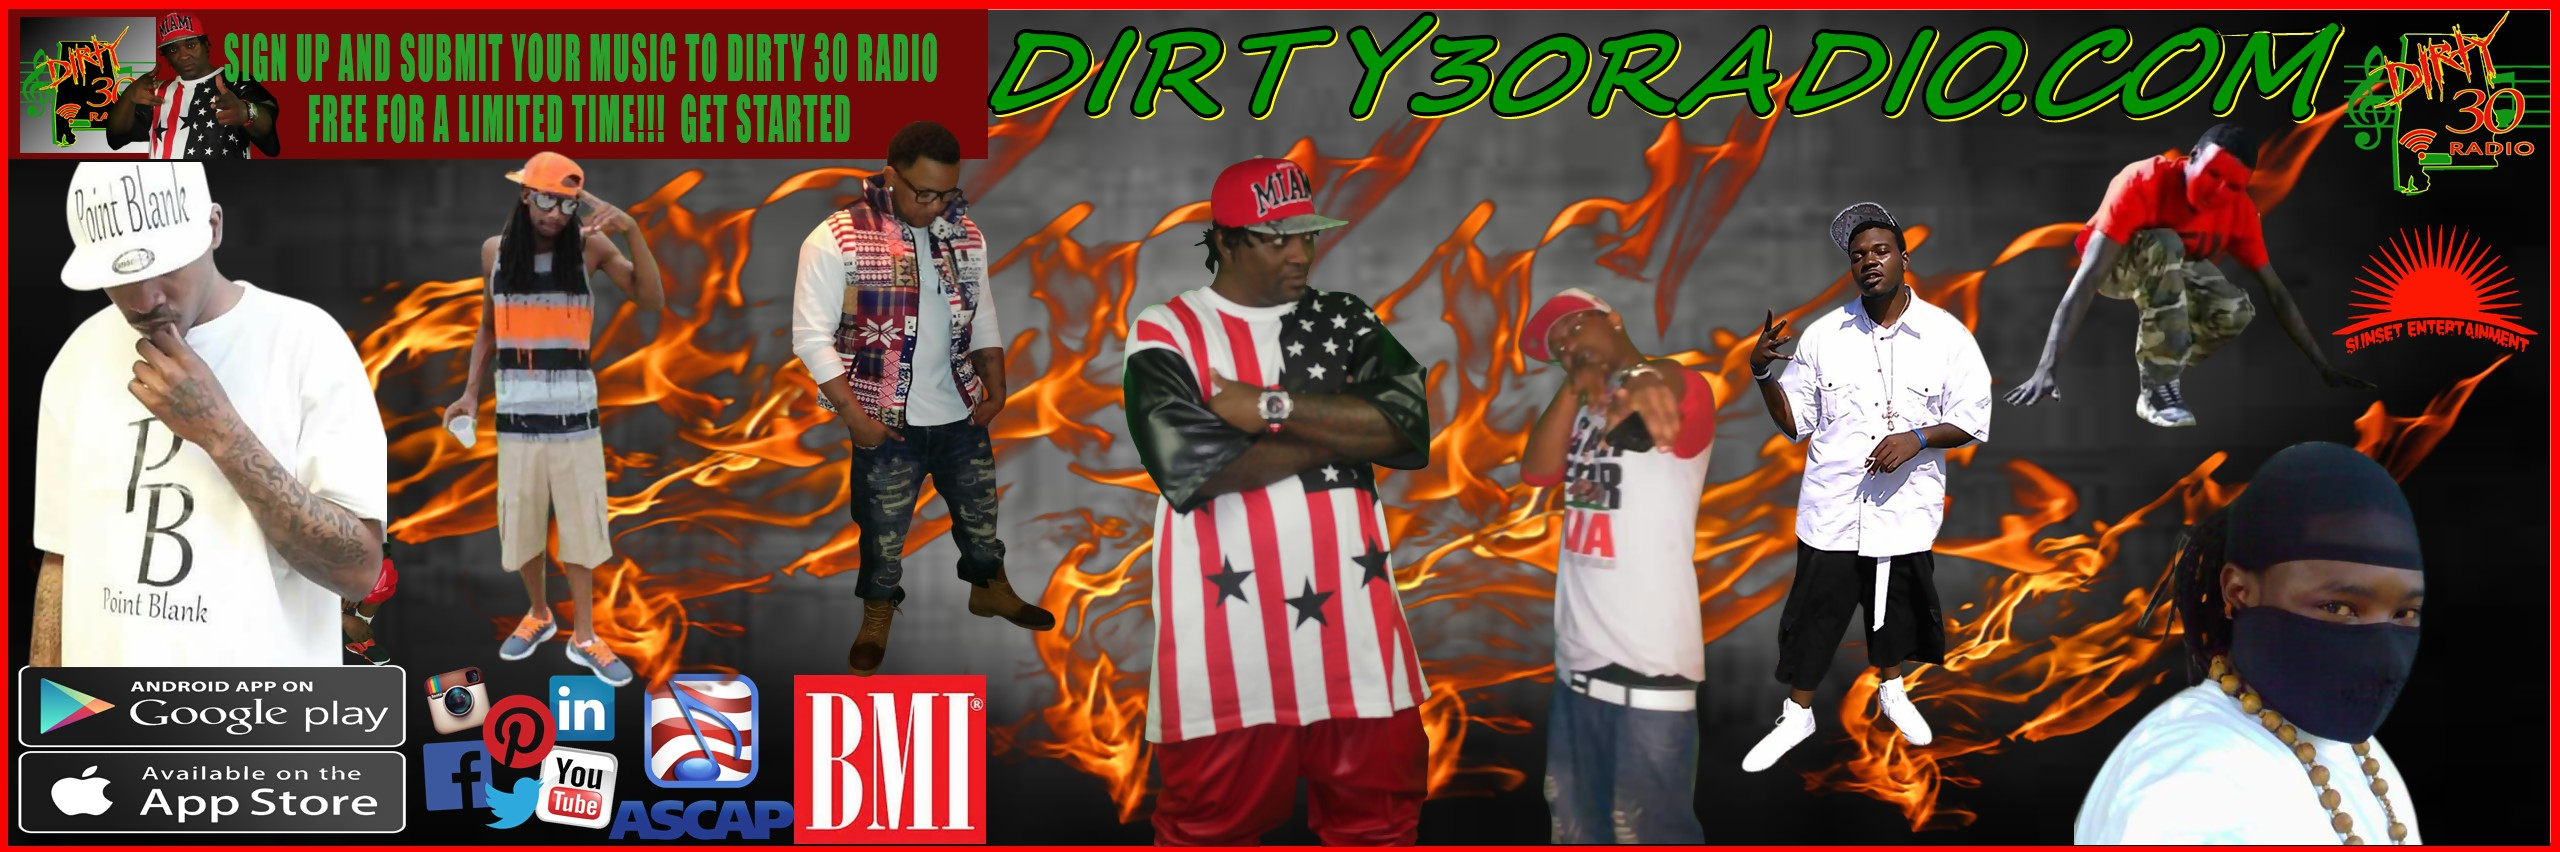 DIRTY30 T.V. (LIVE)